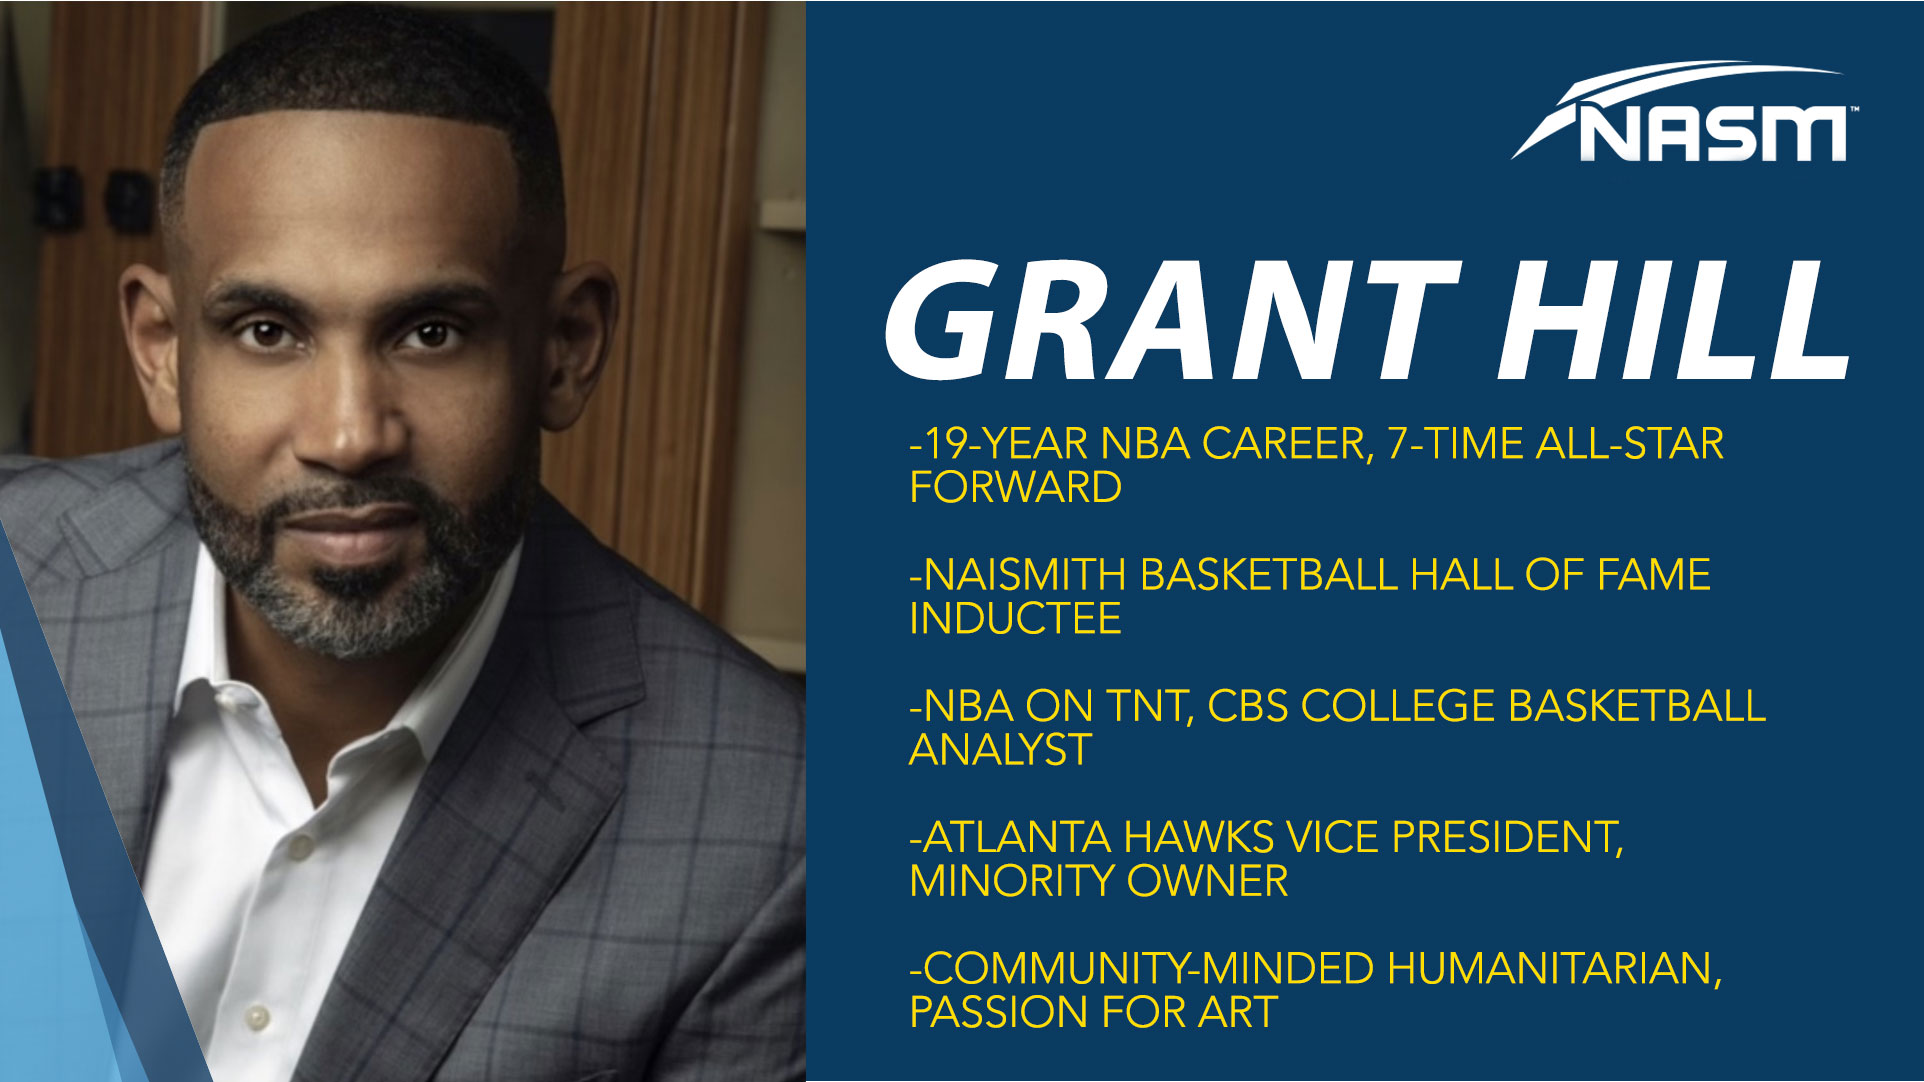 NBA Star Grant Hill NASM